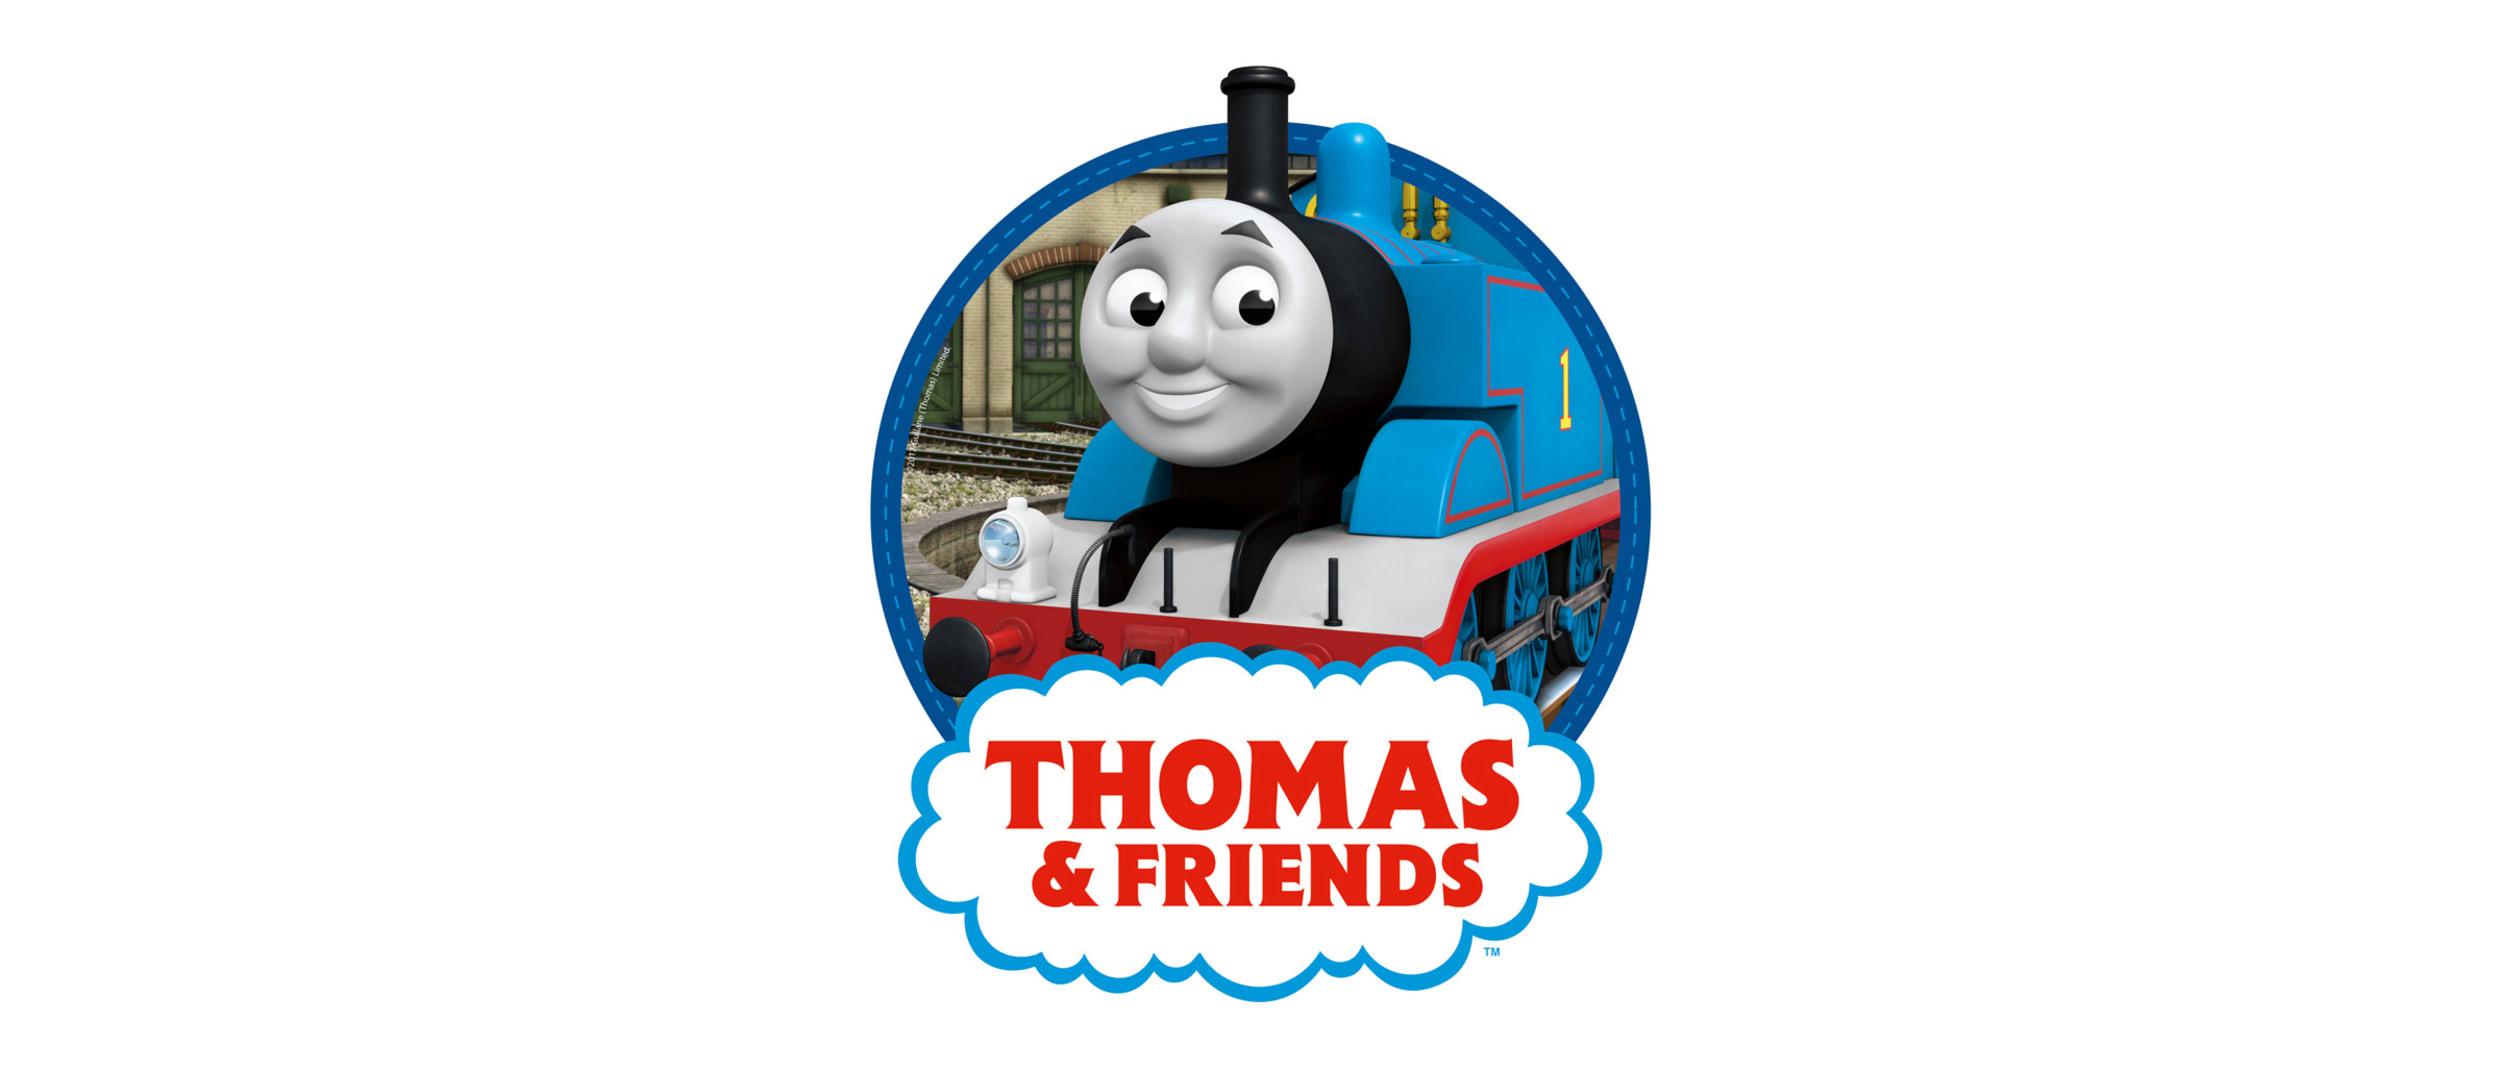 Kids Mornings: Thomas the Tank Engine meet & greet